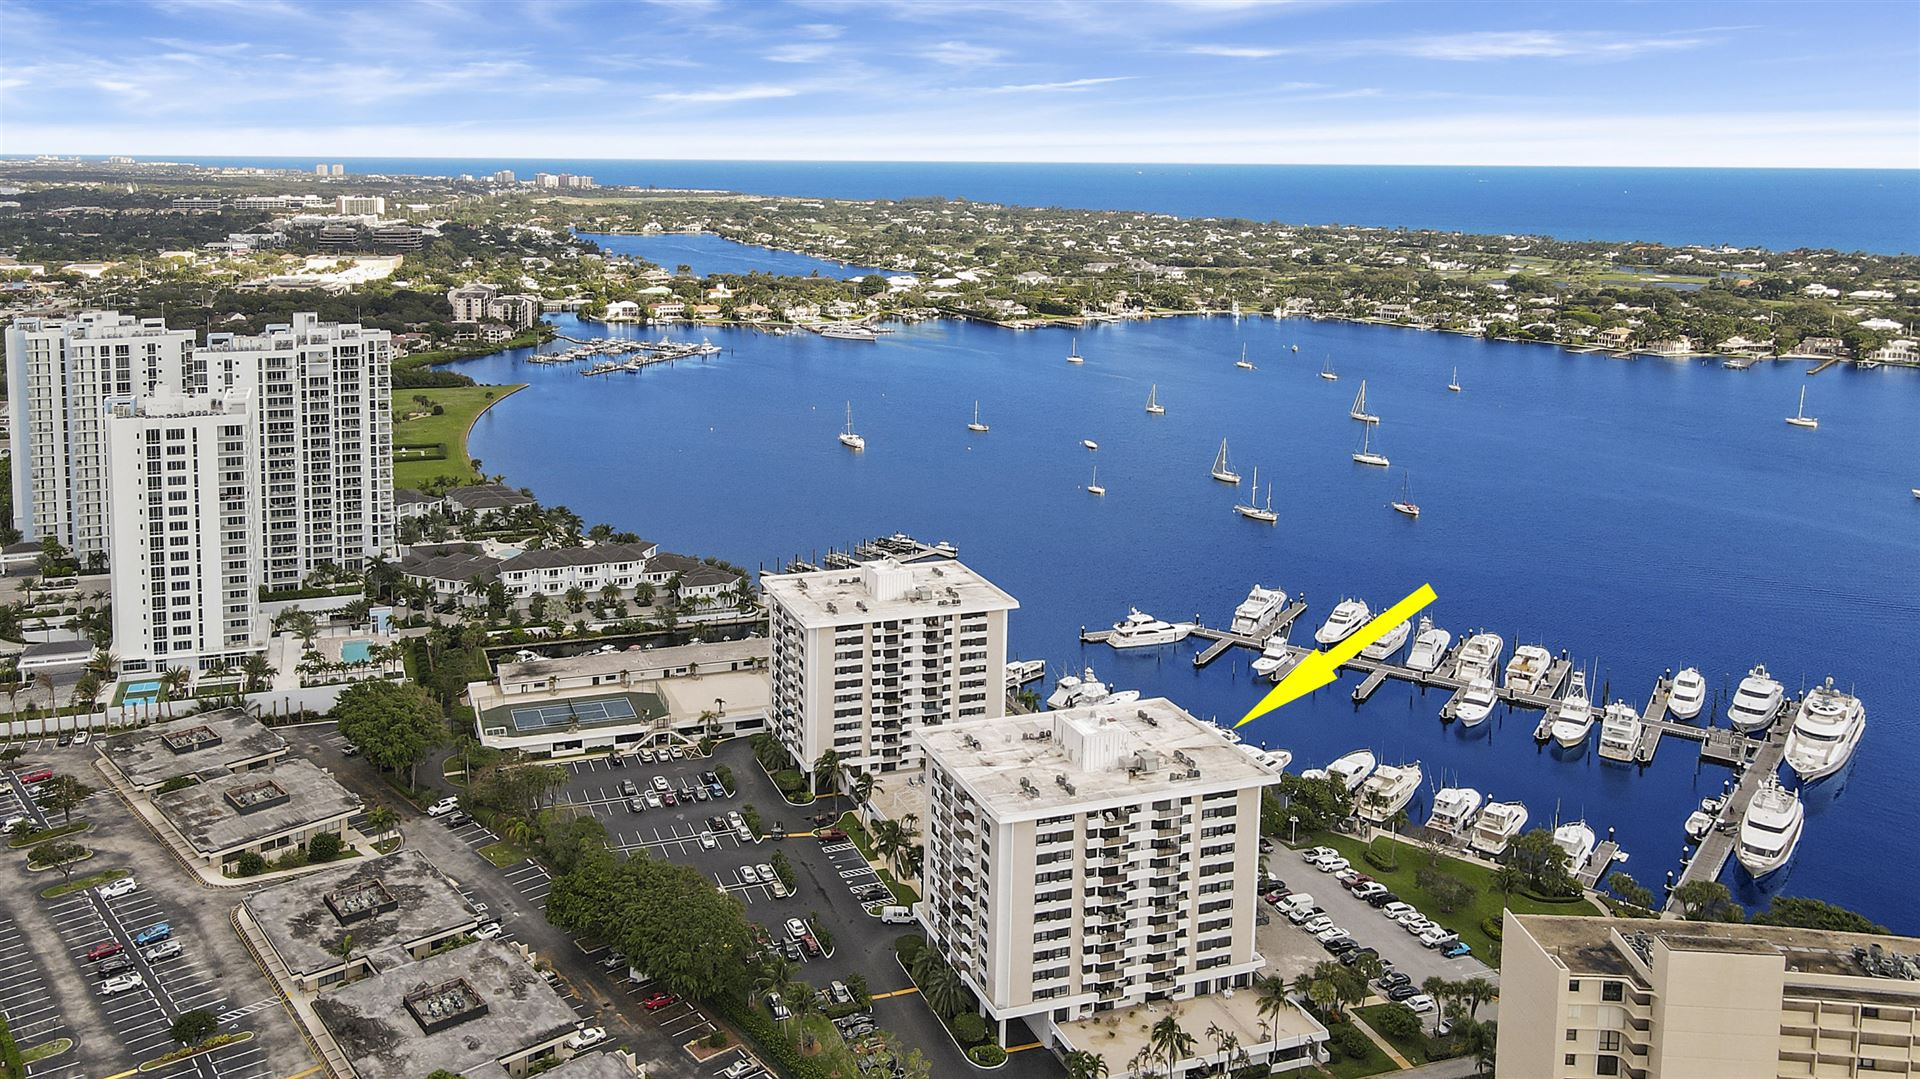 Photo of 1200 Marine Way Way #506, North Palm Beach, FL 33408 (MLS # RX-10672244)